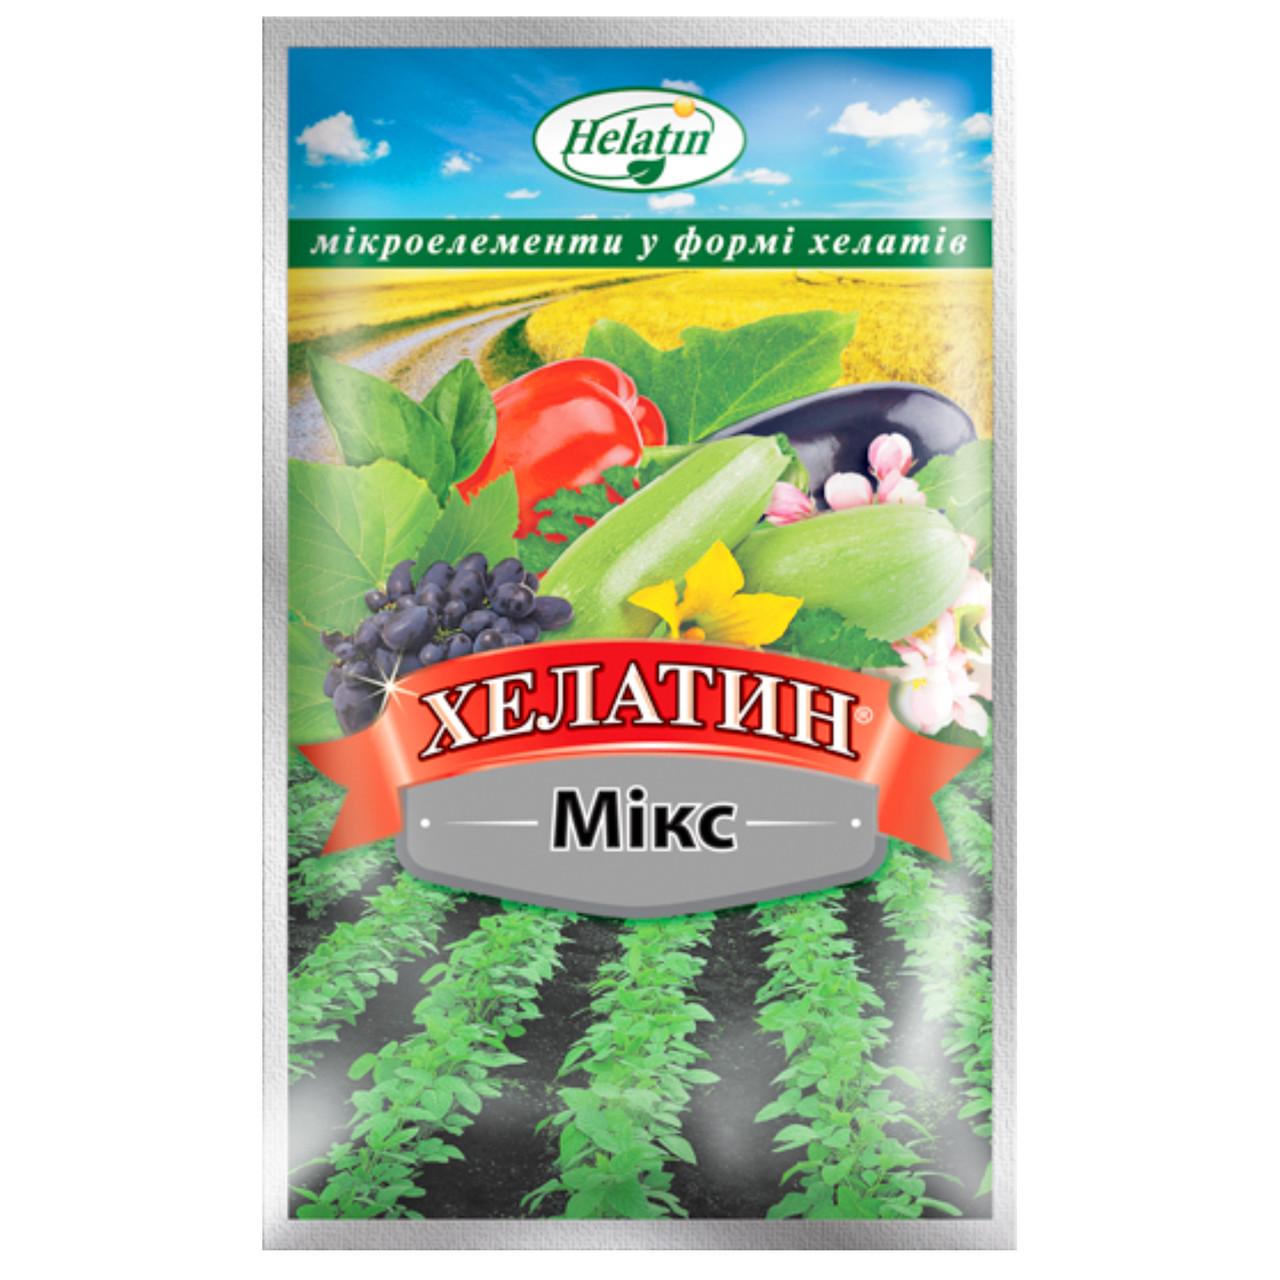 Удобрение Хелатин Микс 50 мл